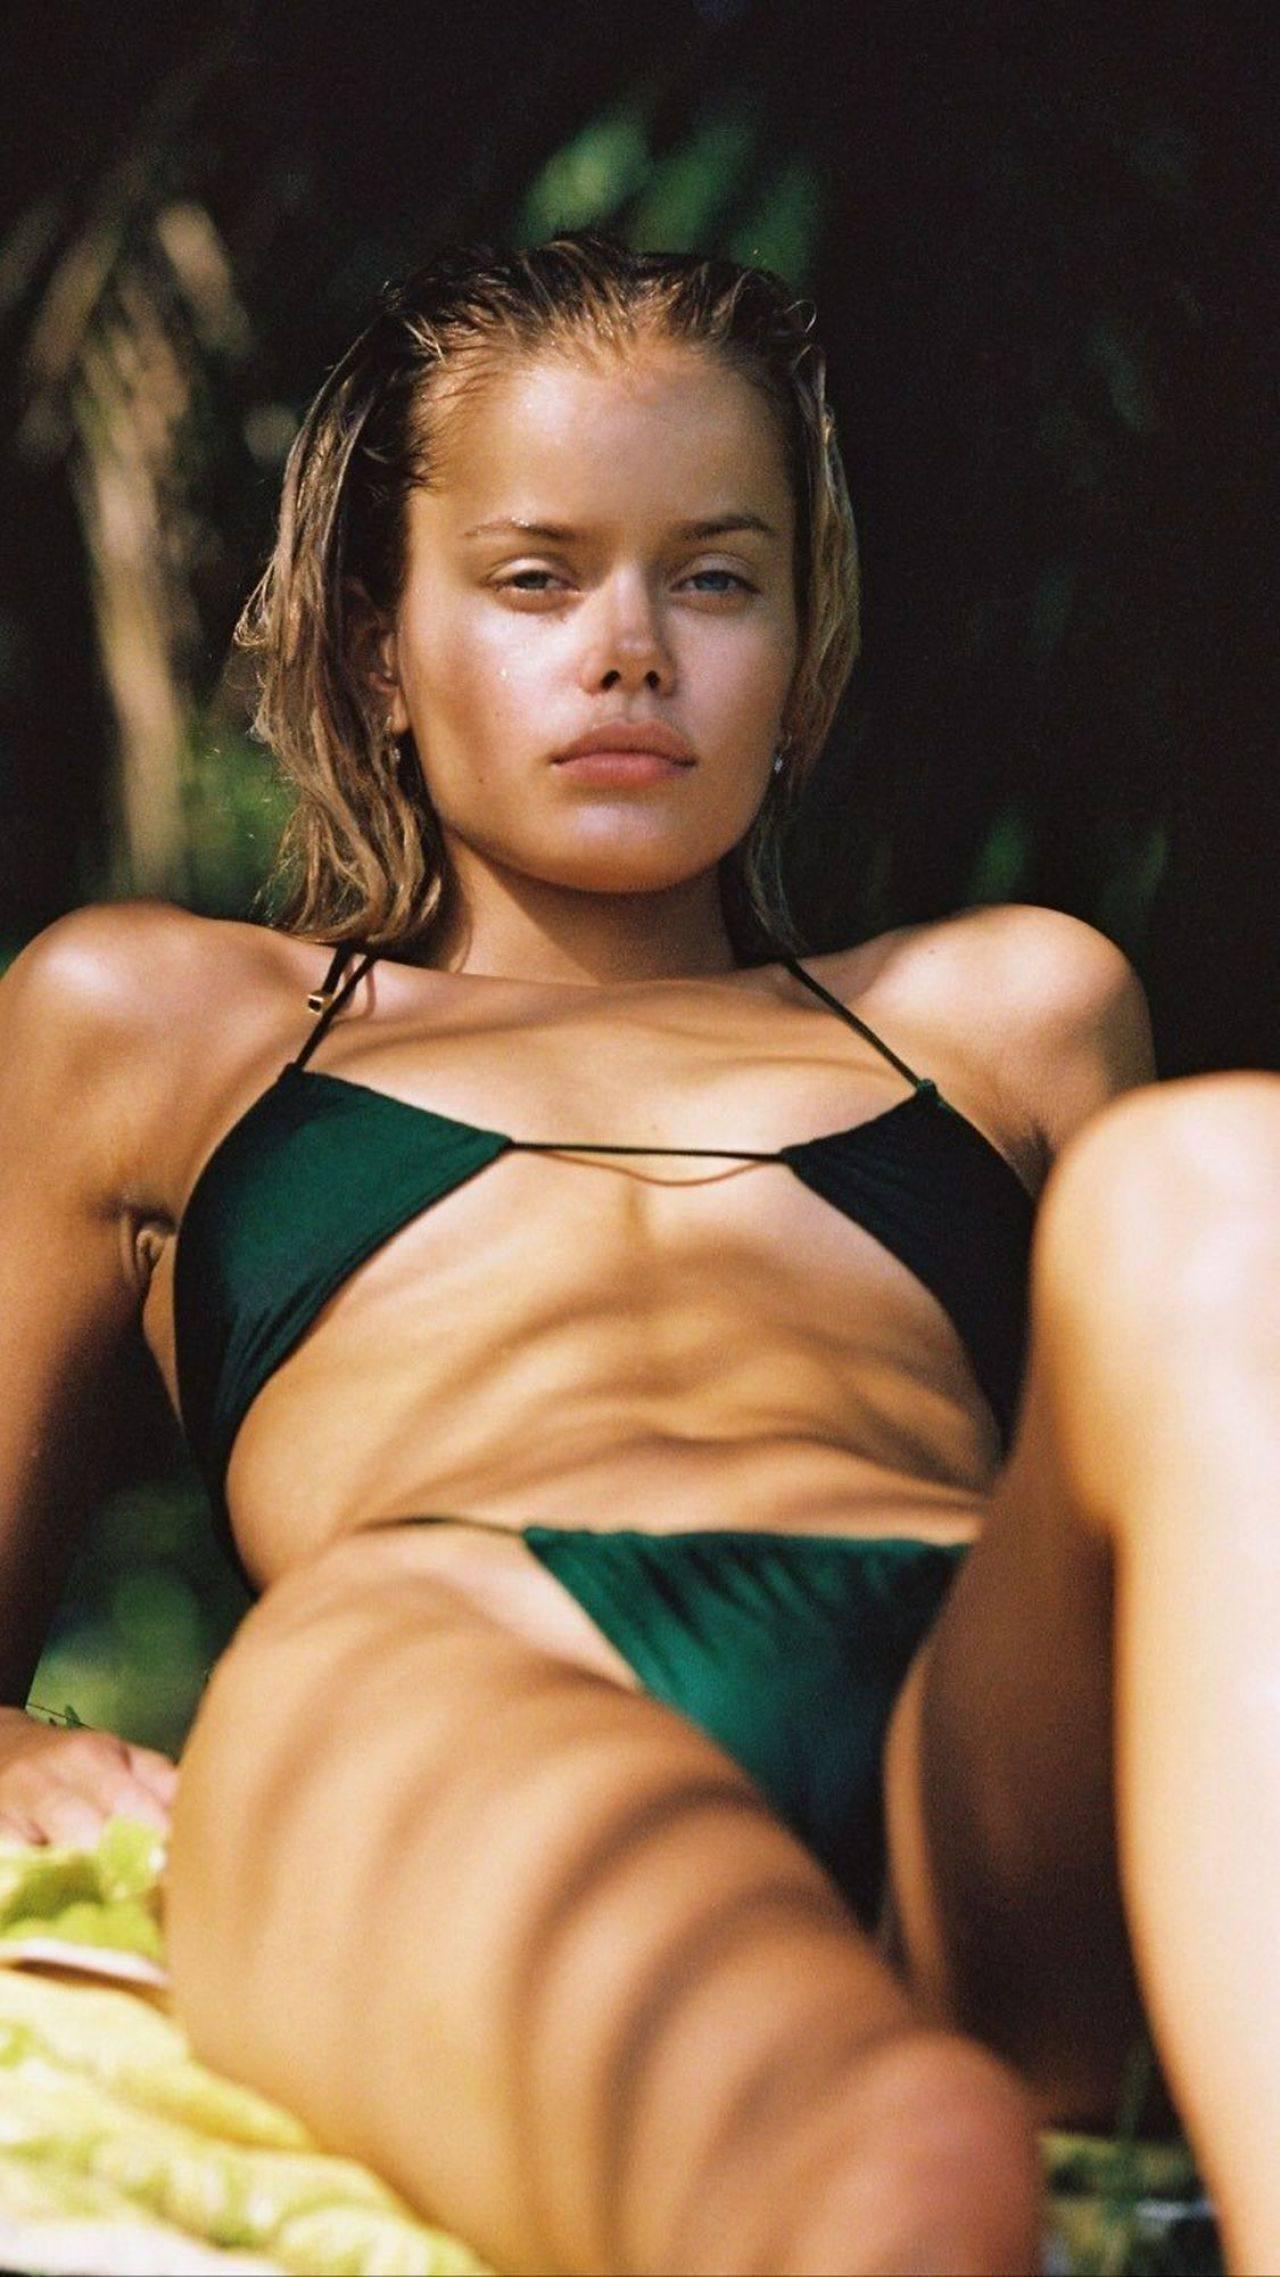 Frida Aasen – Sexy Boobs In Hot Braless Photoshoot 0005